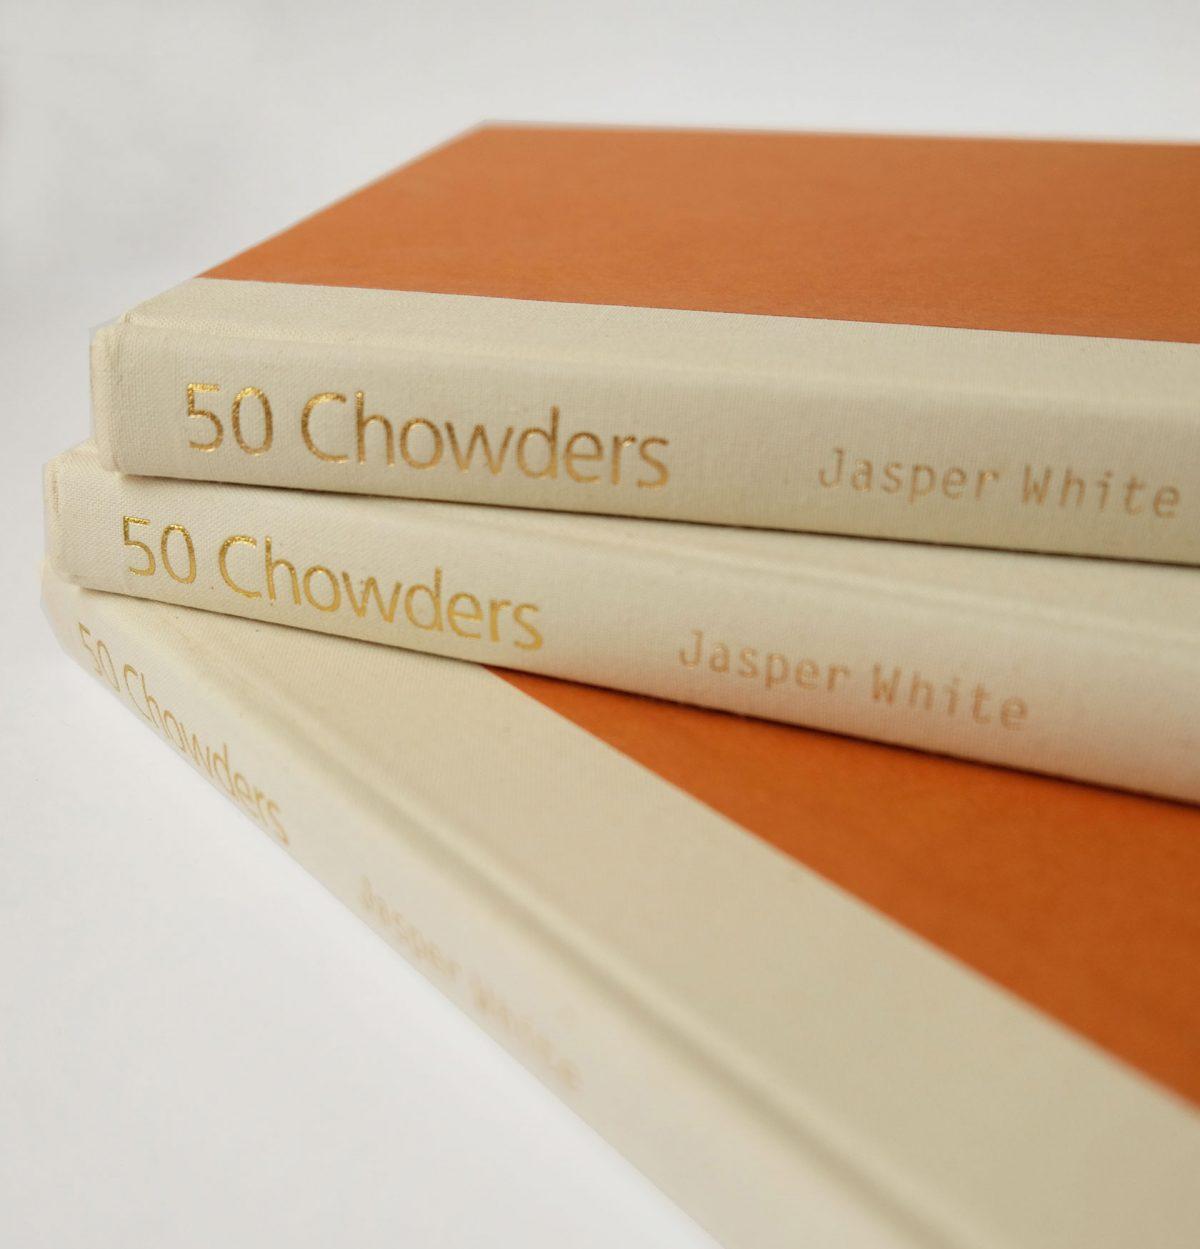 50chowders-jasperwhite-book-simonschuster-0